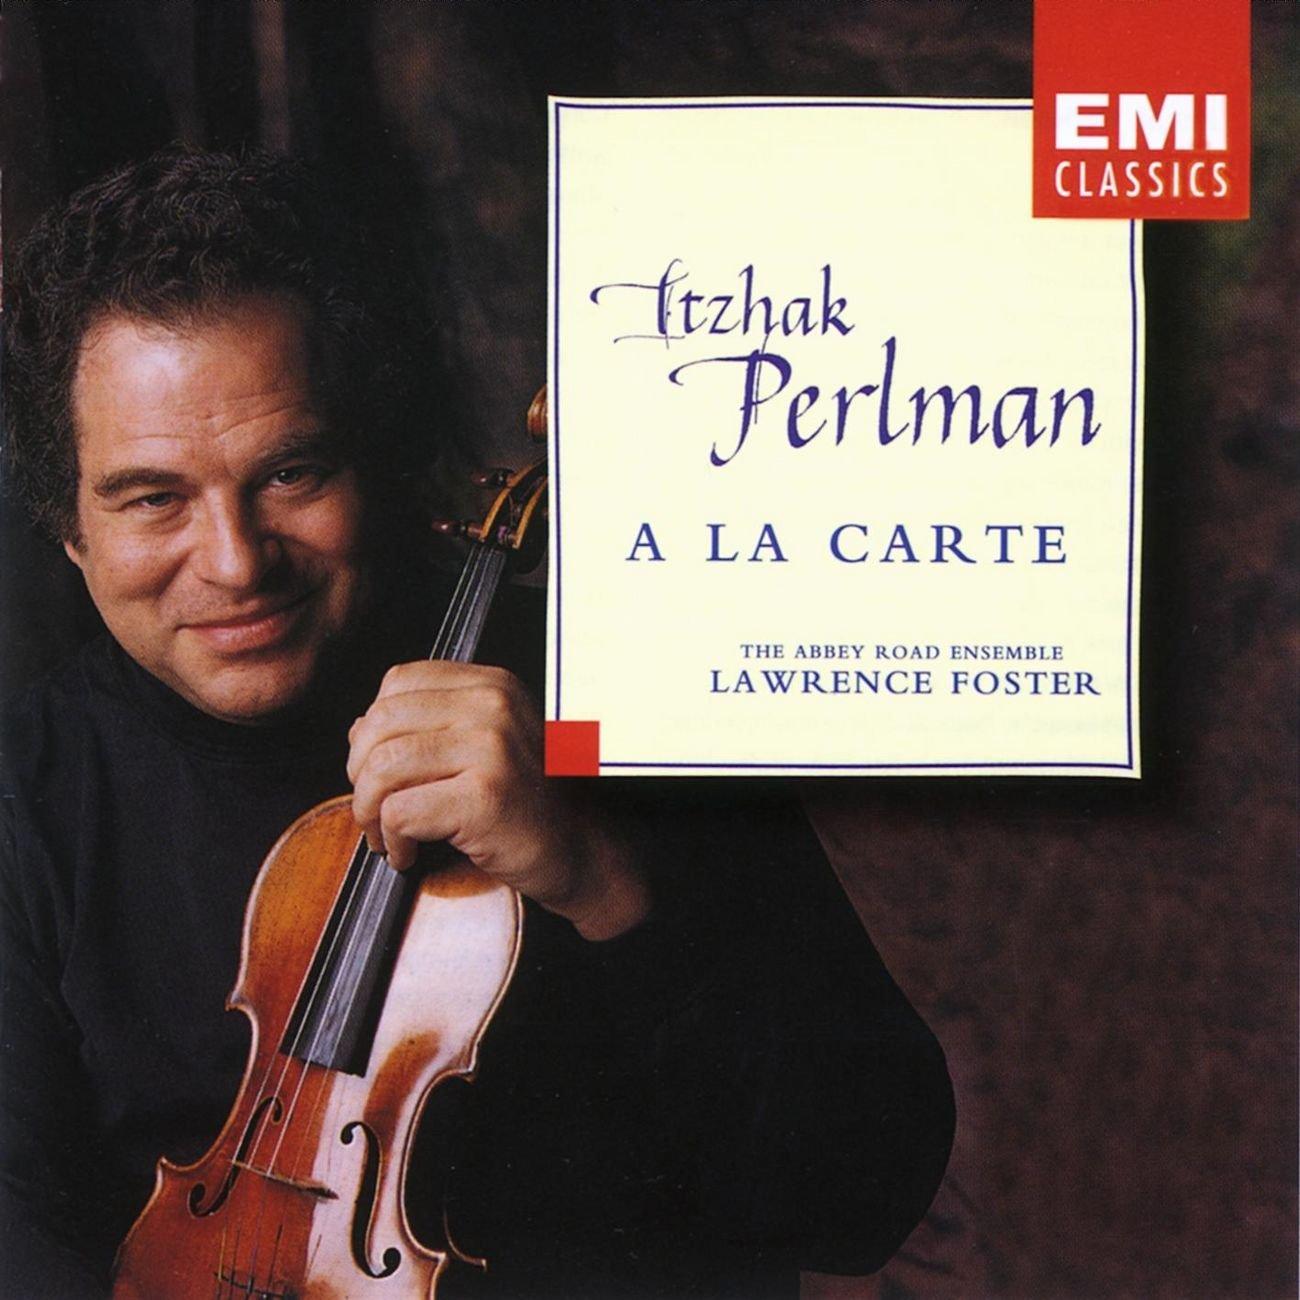 Itzhak Perlman - A la carte / Lawrence Foster by EMI Classics